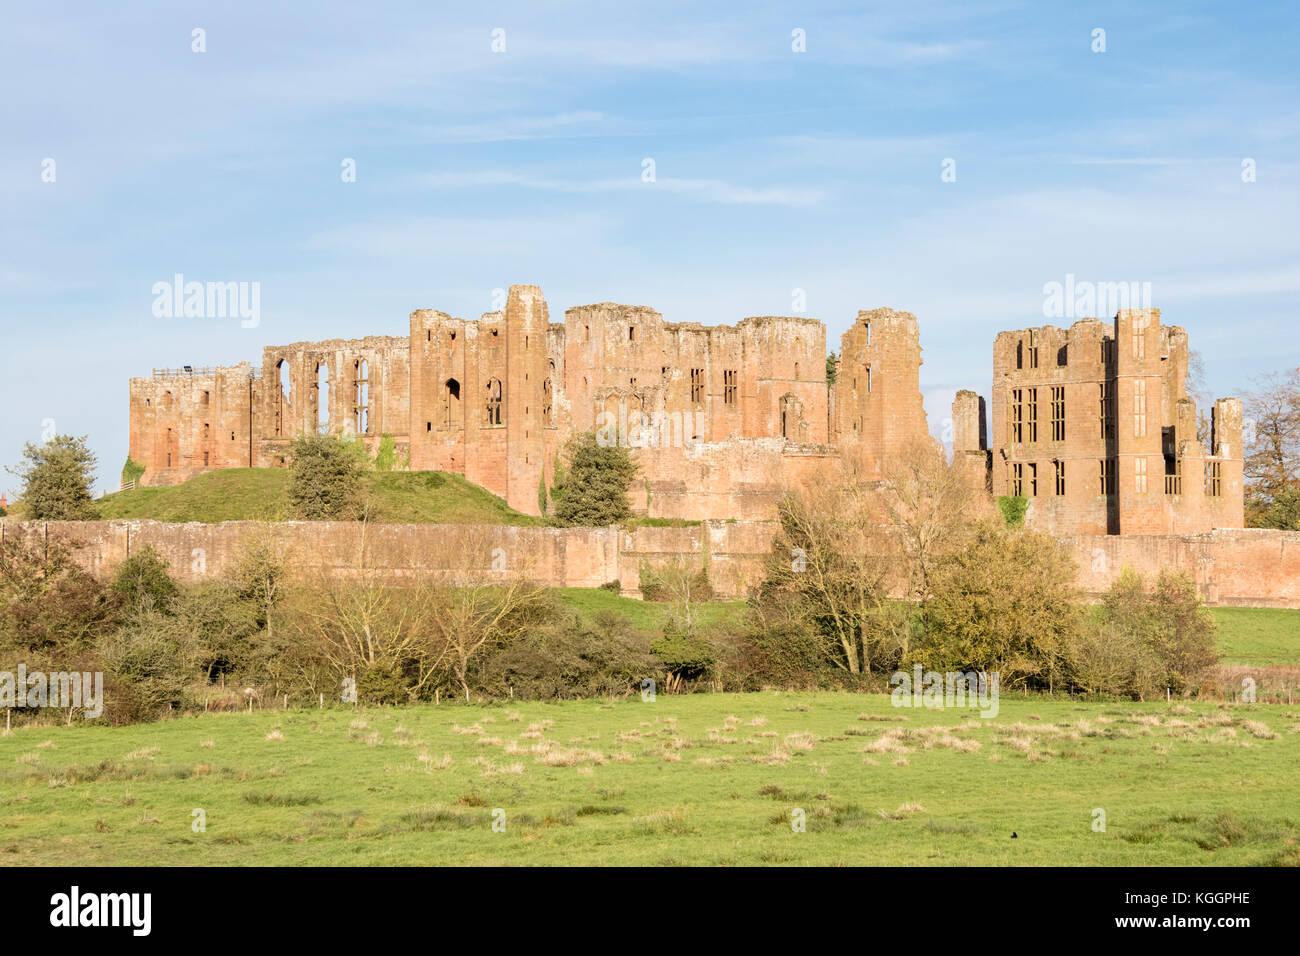 Kenilworth Castle, Kenilworth, Warwickshire, England, UK - Stock Image